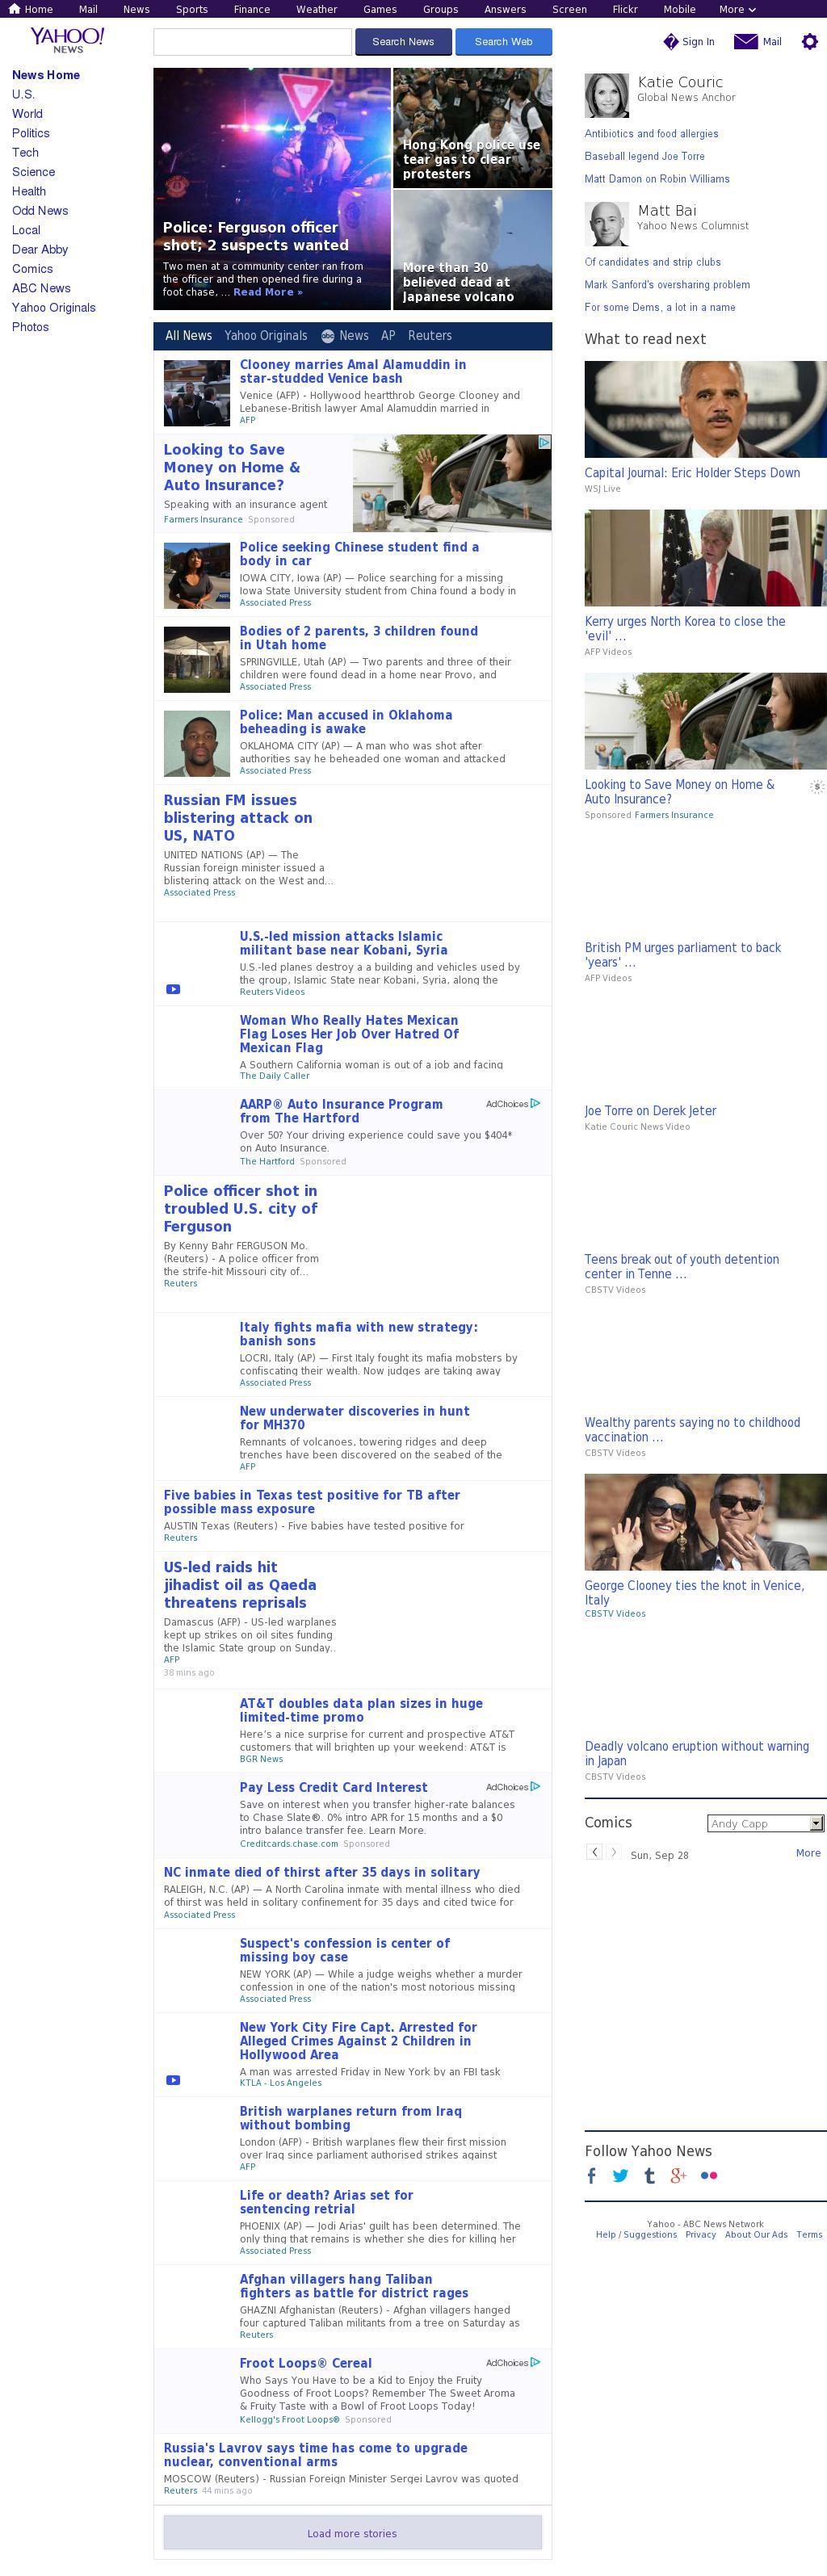 Yahoo! News at Sunday Sept. 28, 2014, 11:19 a.m. UTC